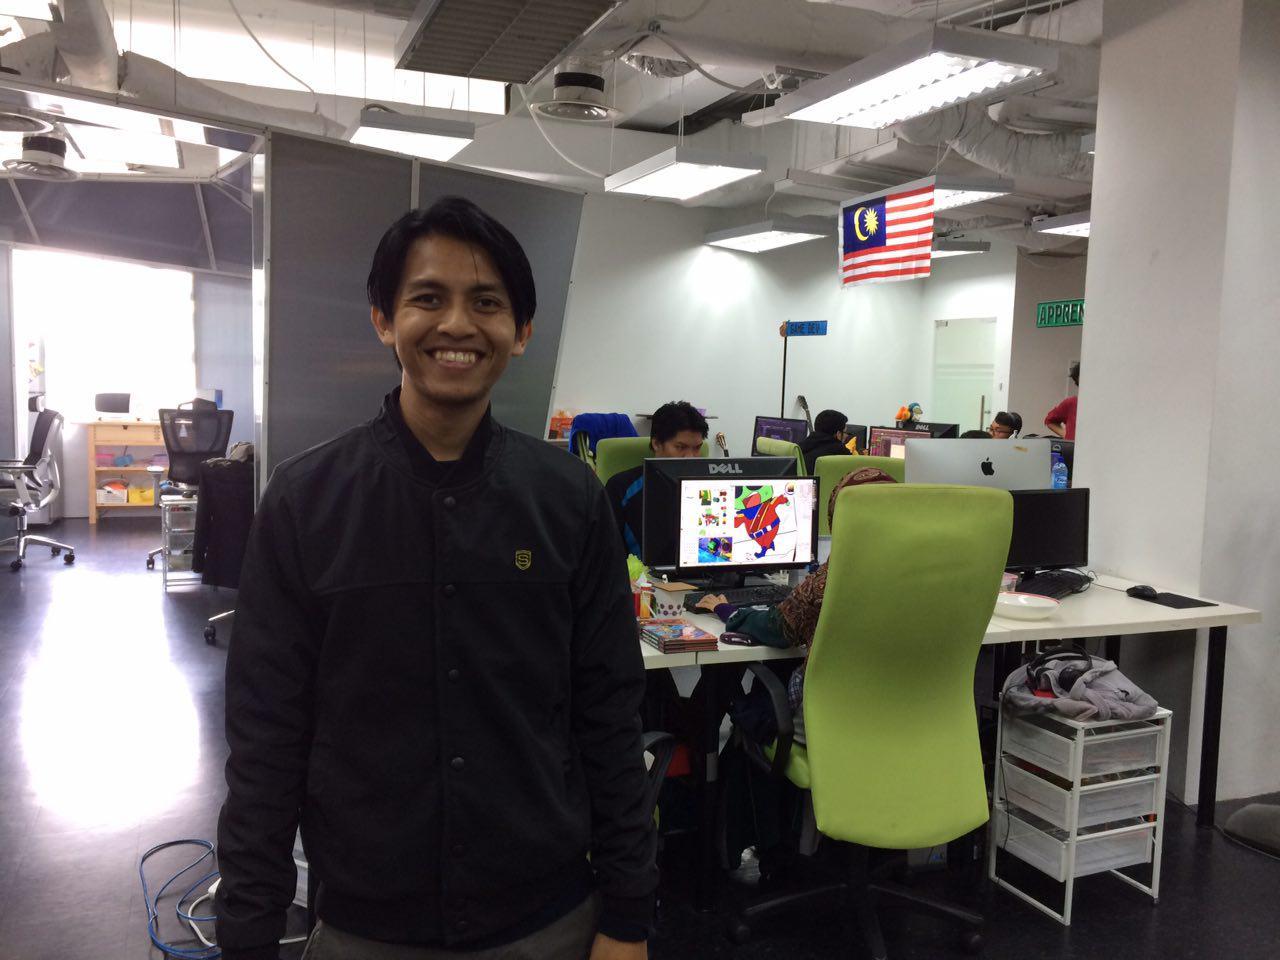 Bersama-sama Safwan berjalan sekitar pejabat baru Animonster Studios. Markas kotak di belakang.